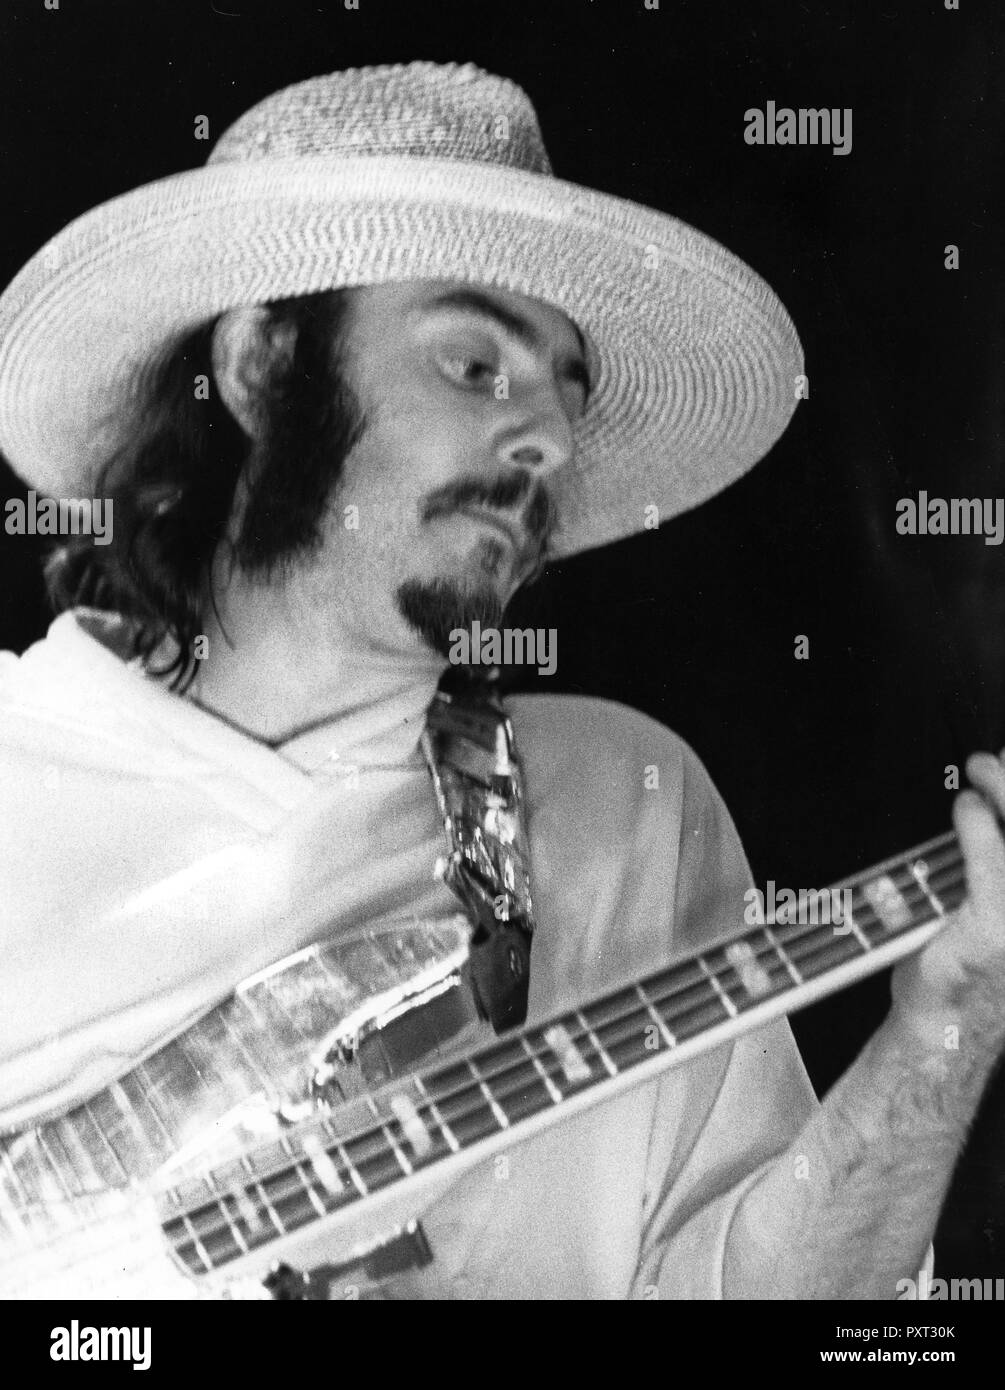 jeffrey hammond, jethro tull, 70s - Stock Image